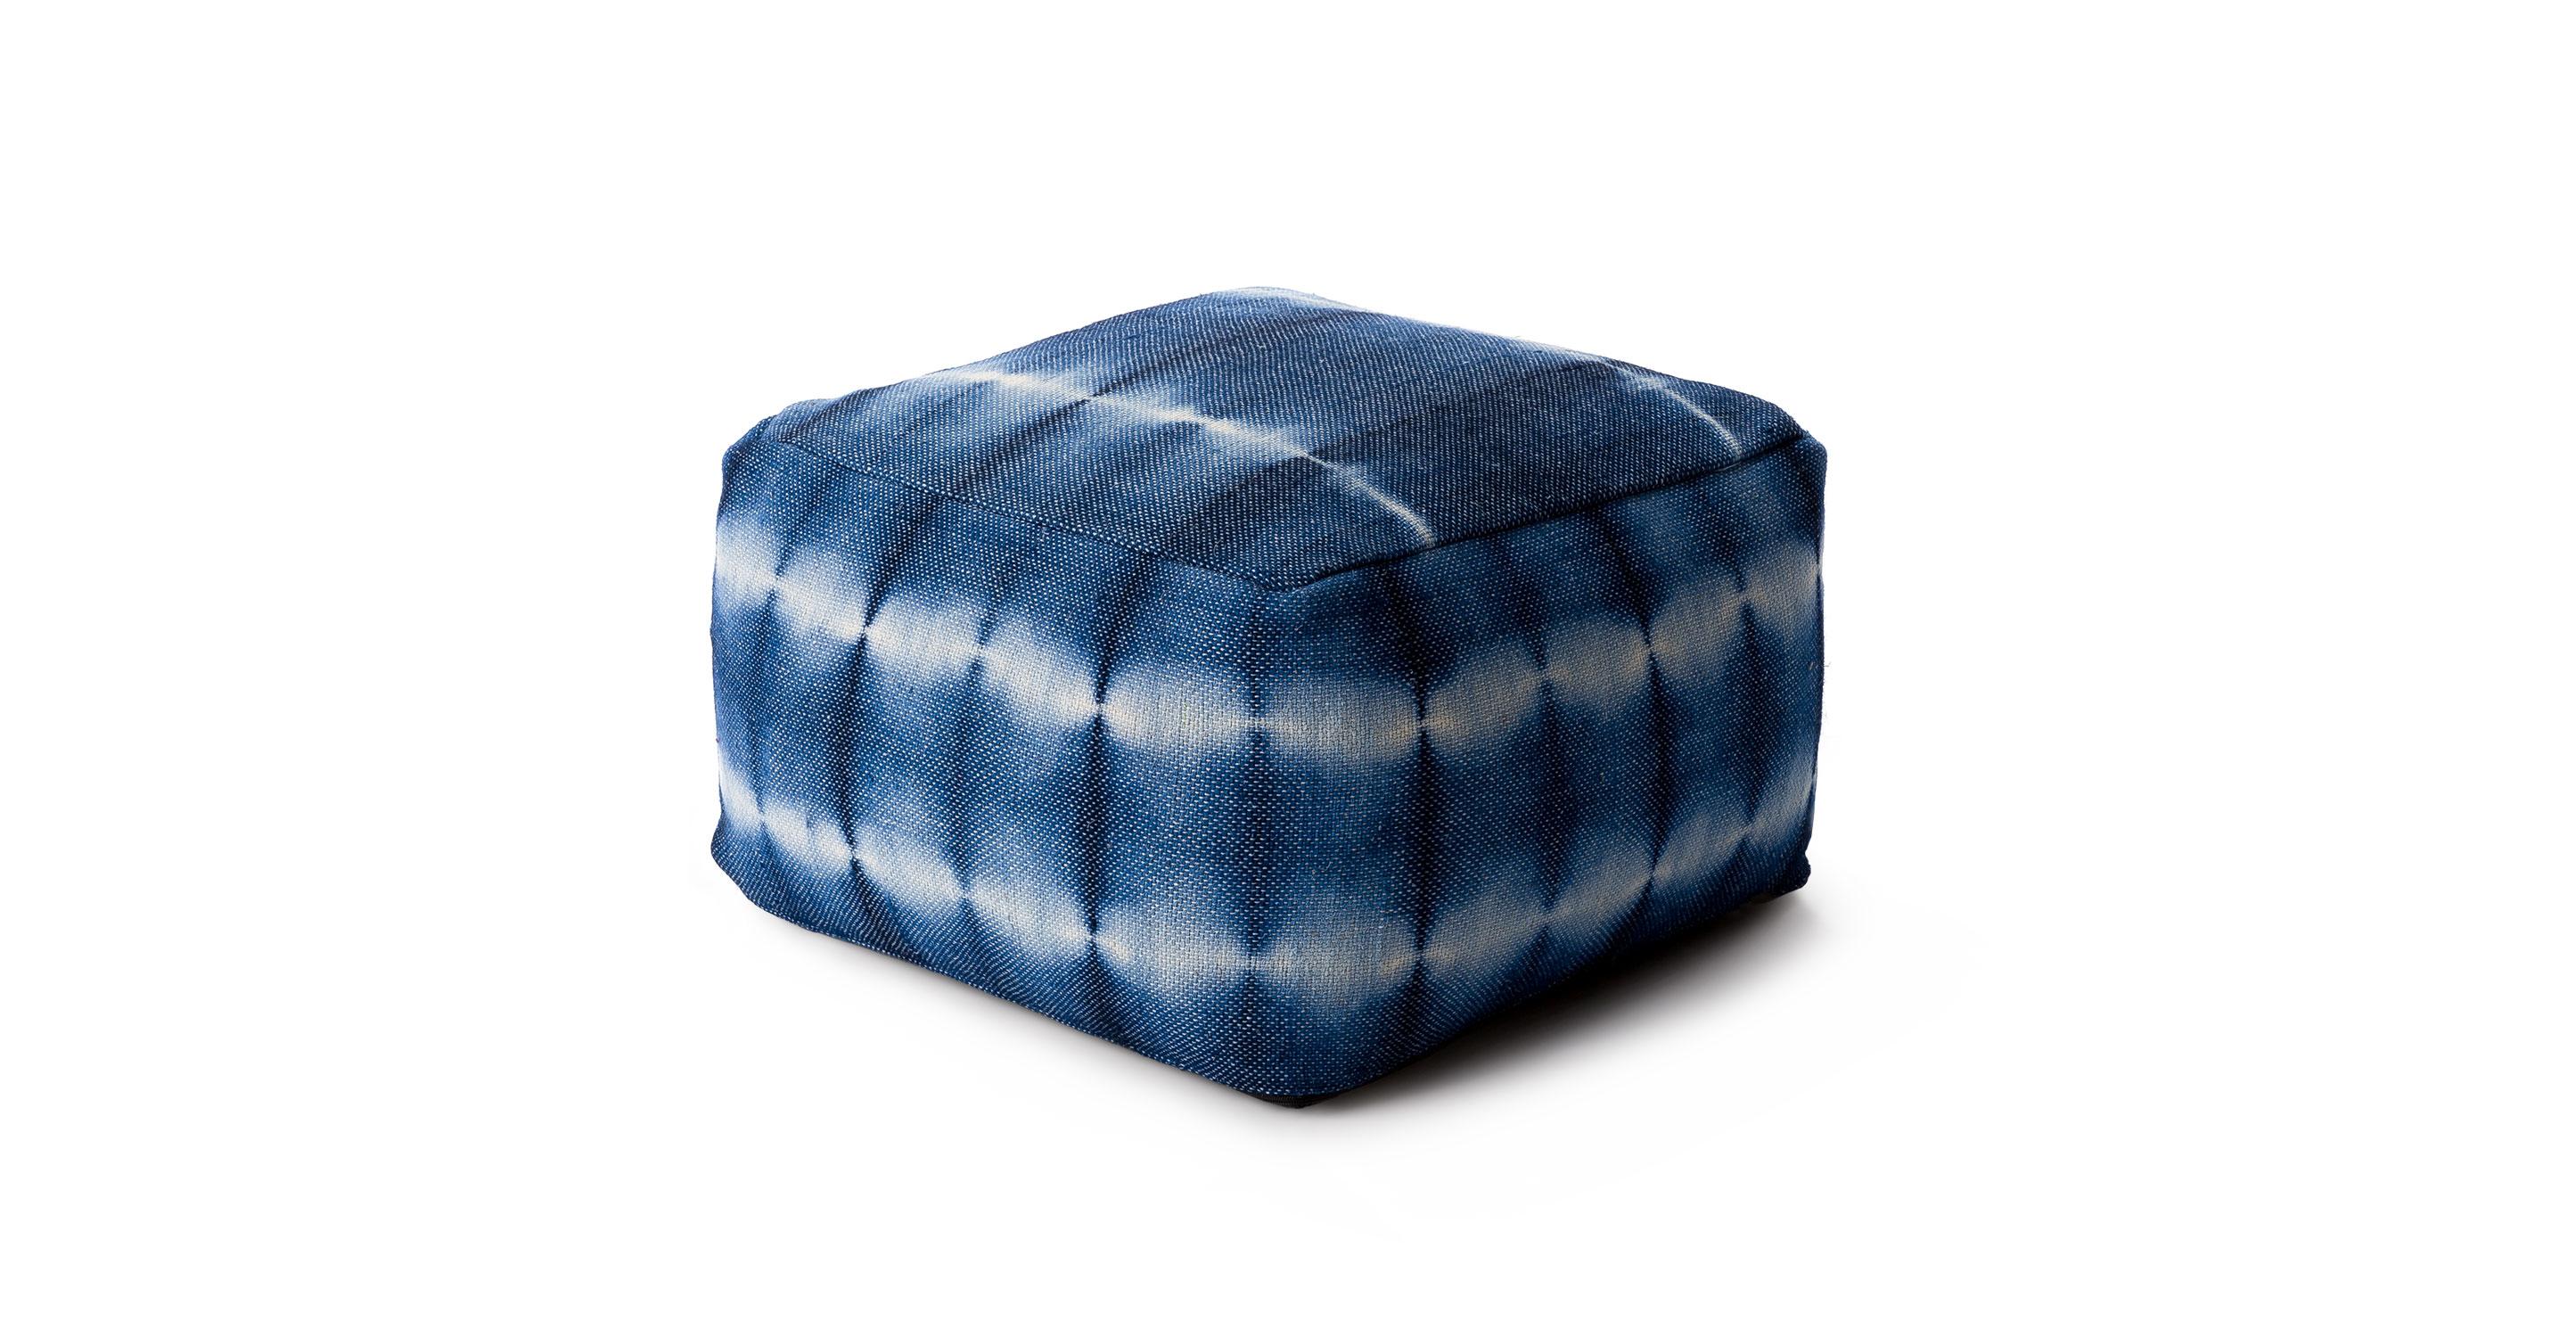 shibori indigo pouf rugs article modern mid century and scandinavian furniture. Black Bedroom Furniture Sets. Home Design Ideas